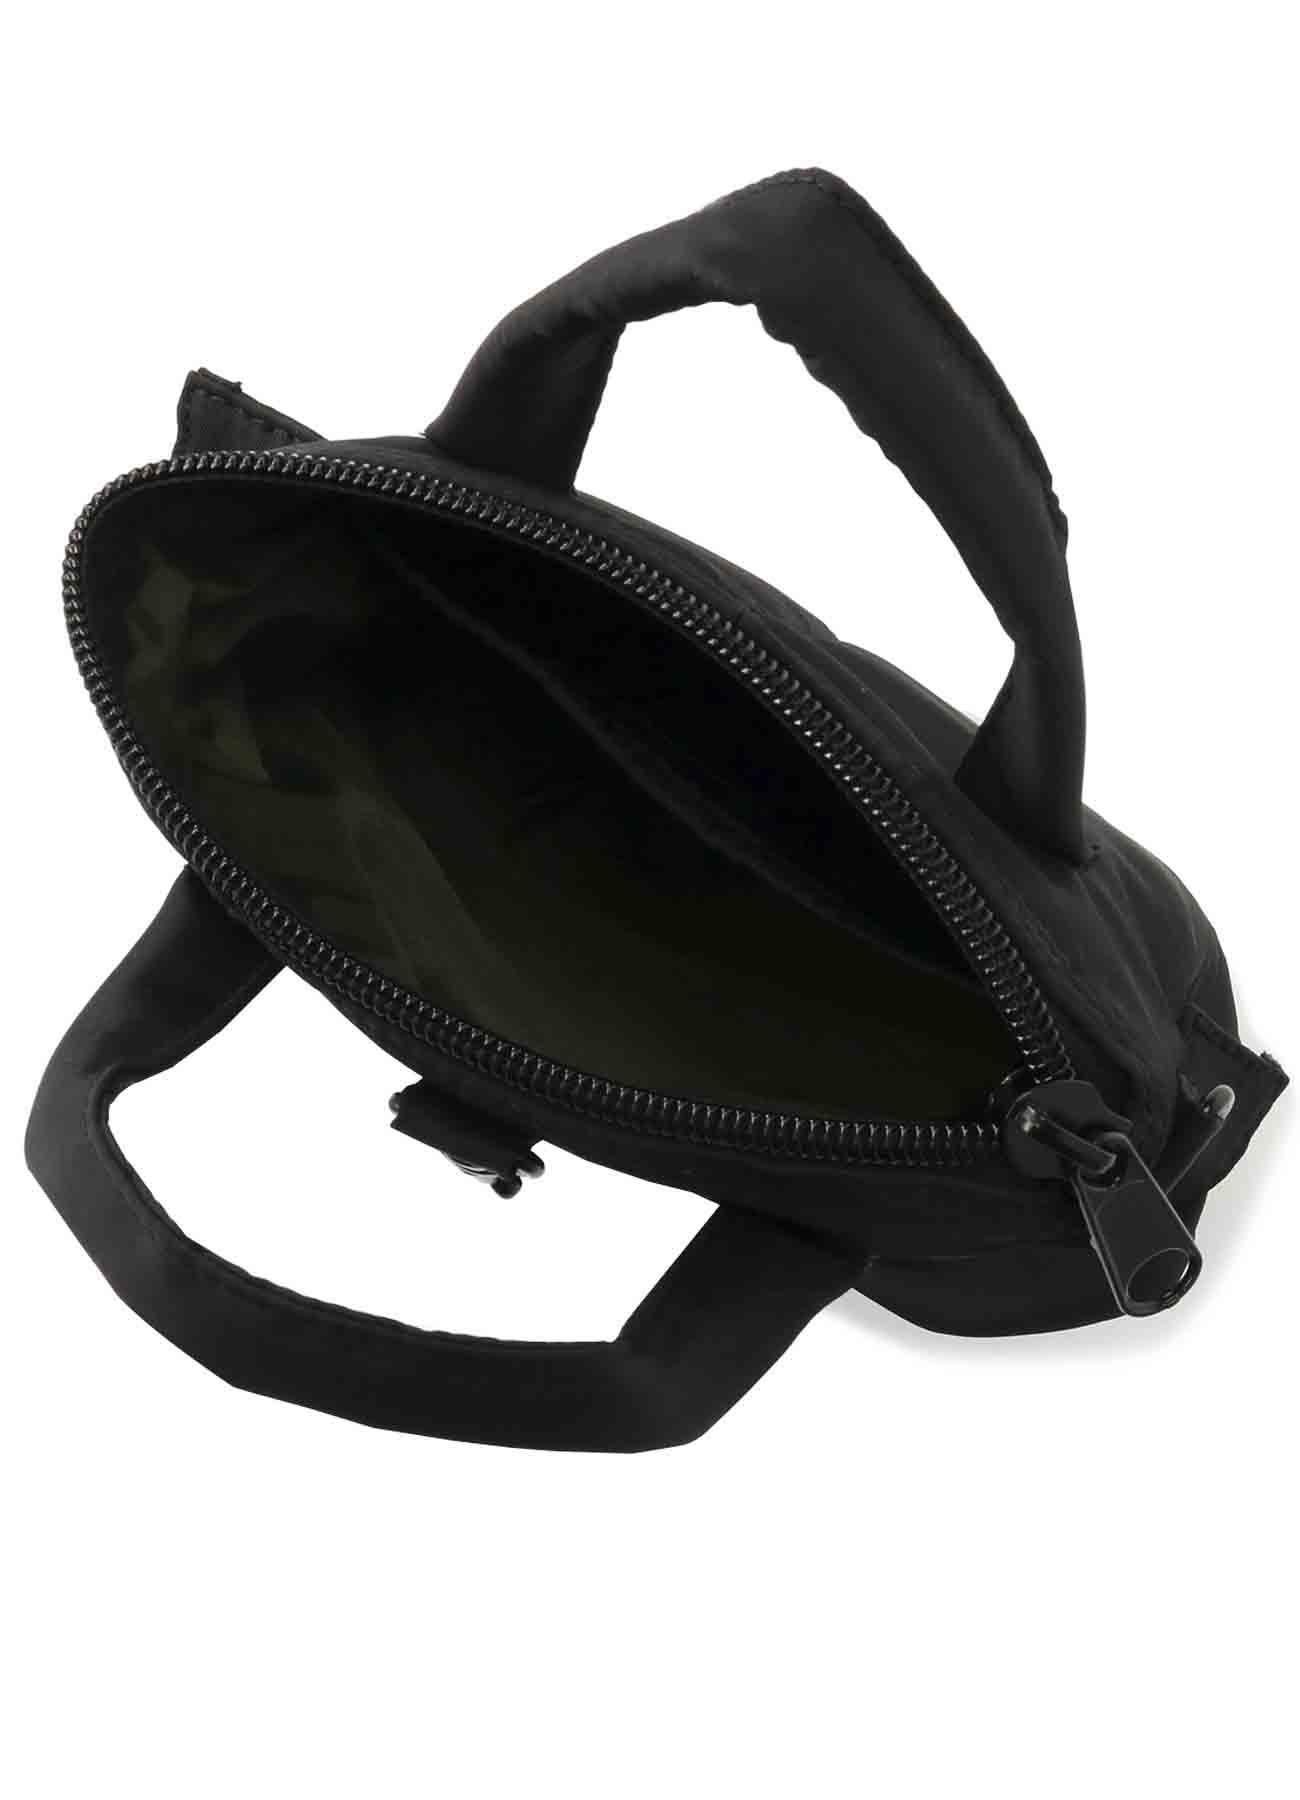 Small Helmet Bag